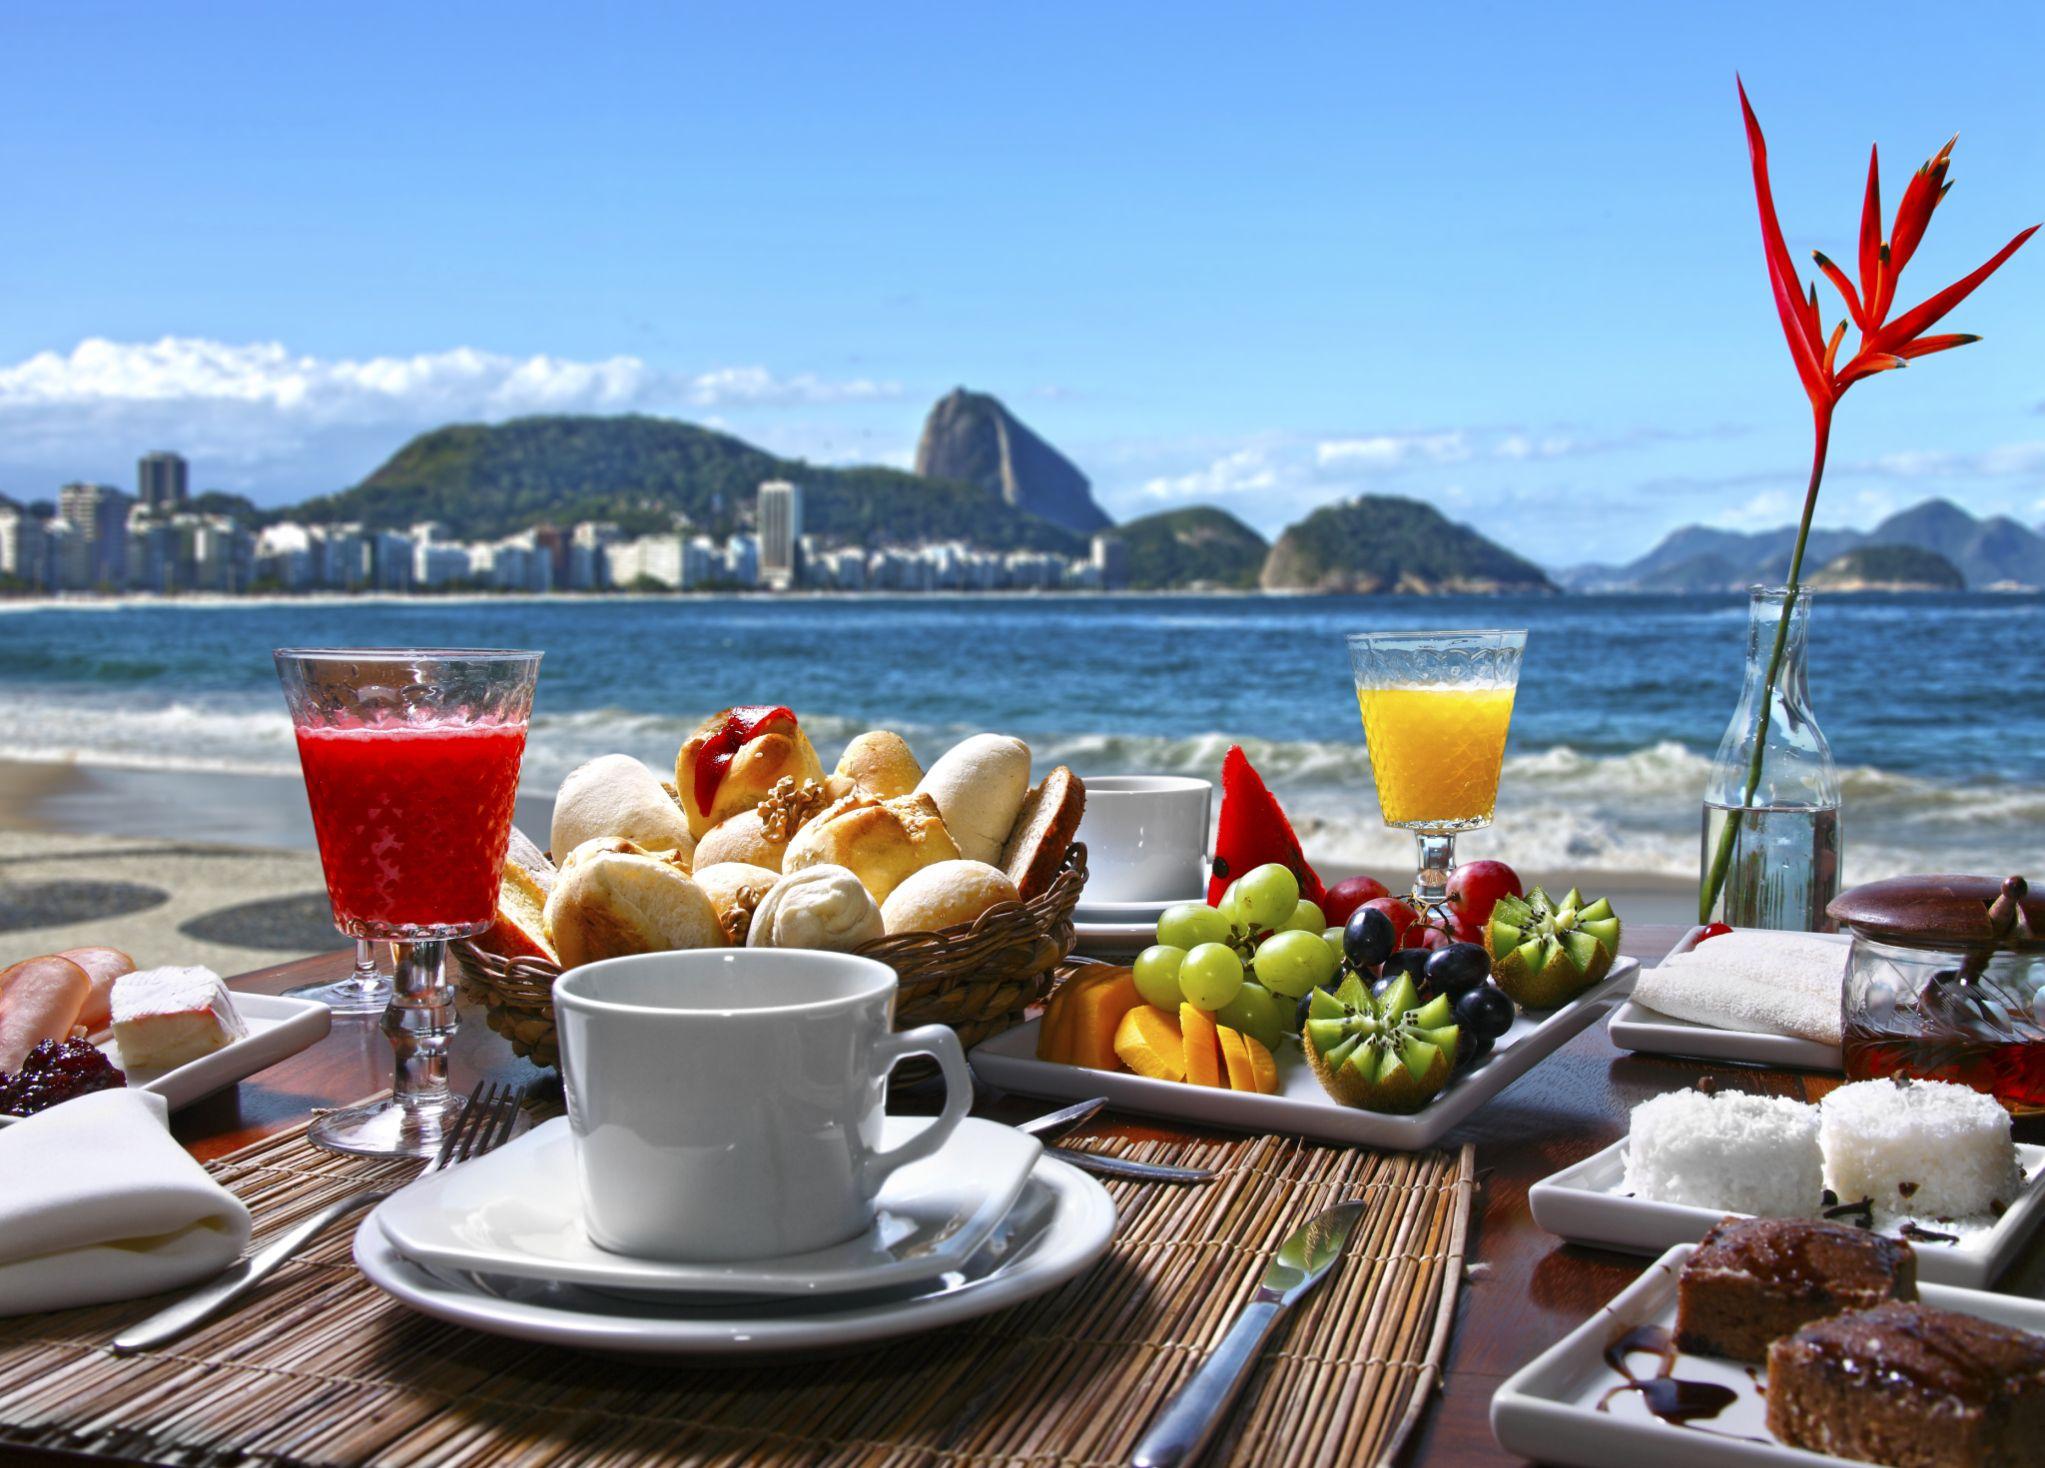 World Cup Brazil 10 Best Restaurants In Rio De Janeiro Ehow Uk